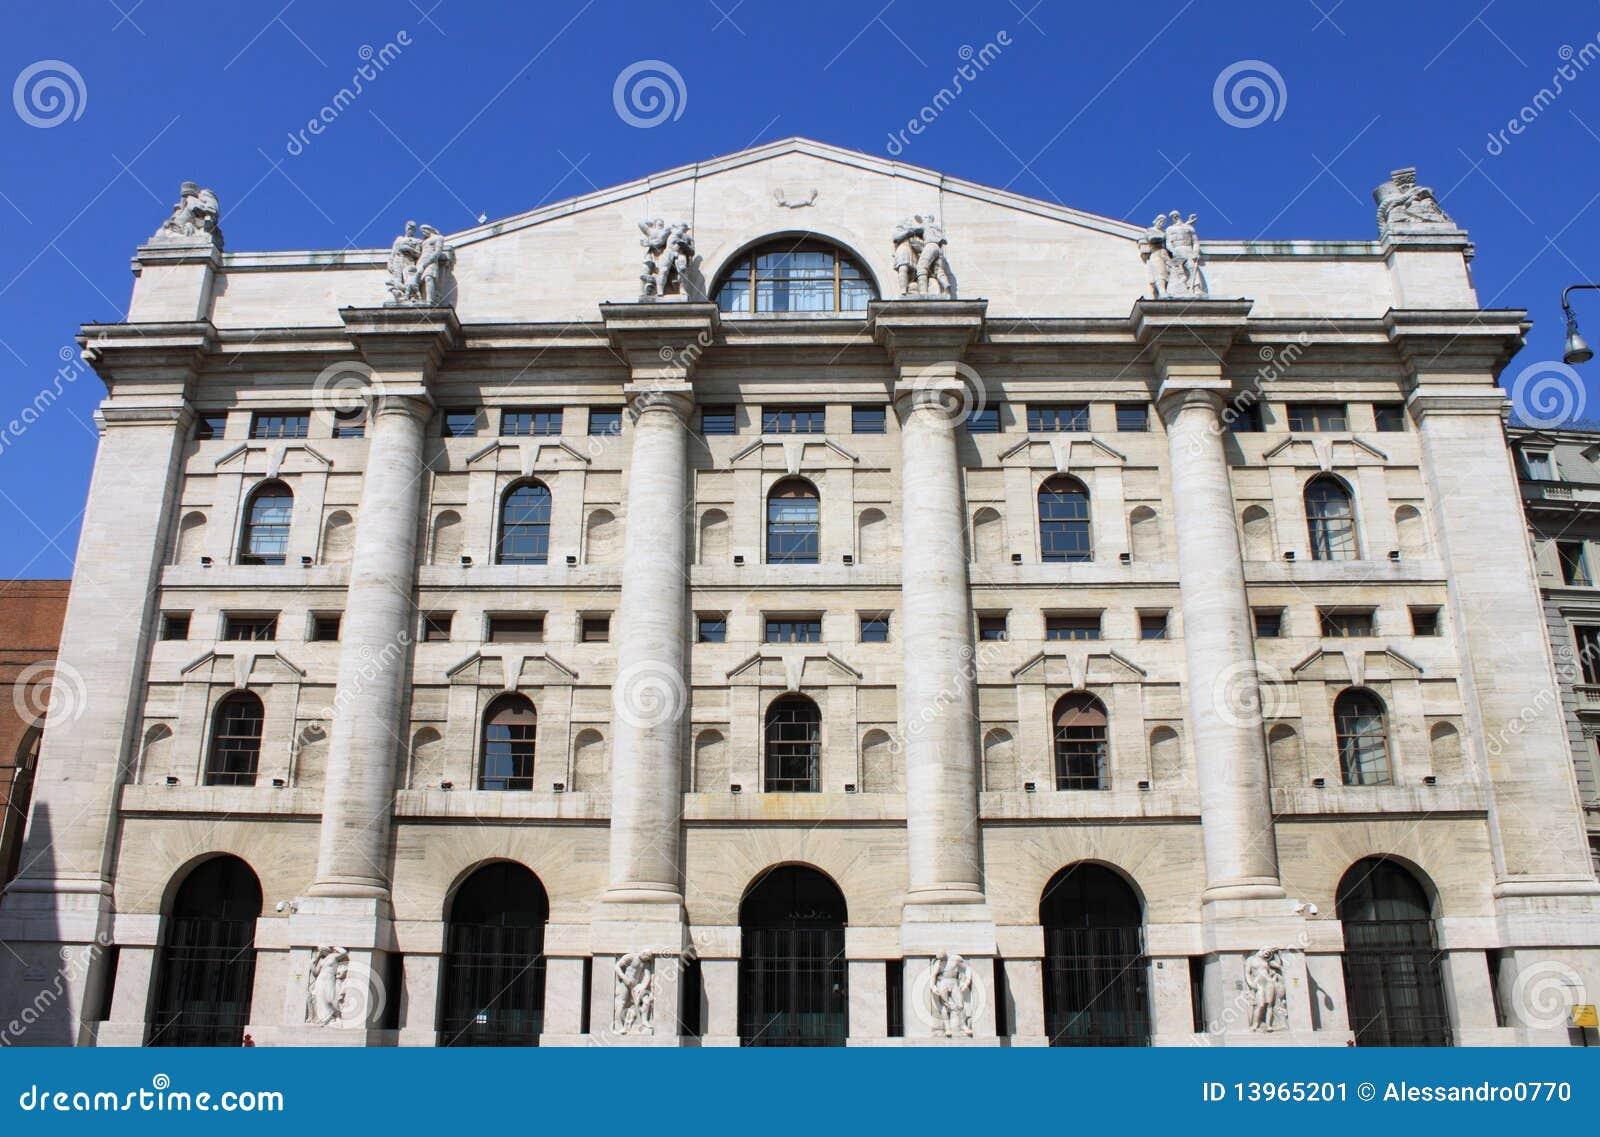 Italian Stock Exchange In Milan Stock Image - Image: 13965201